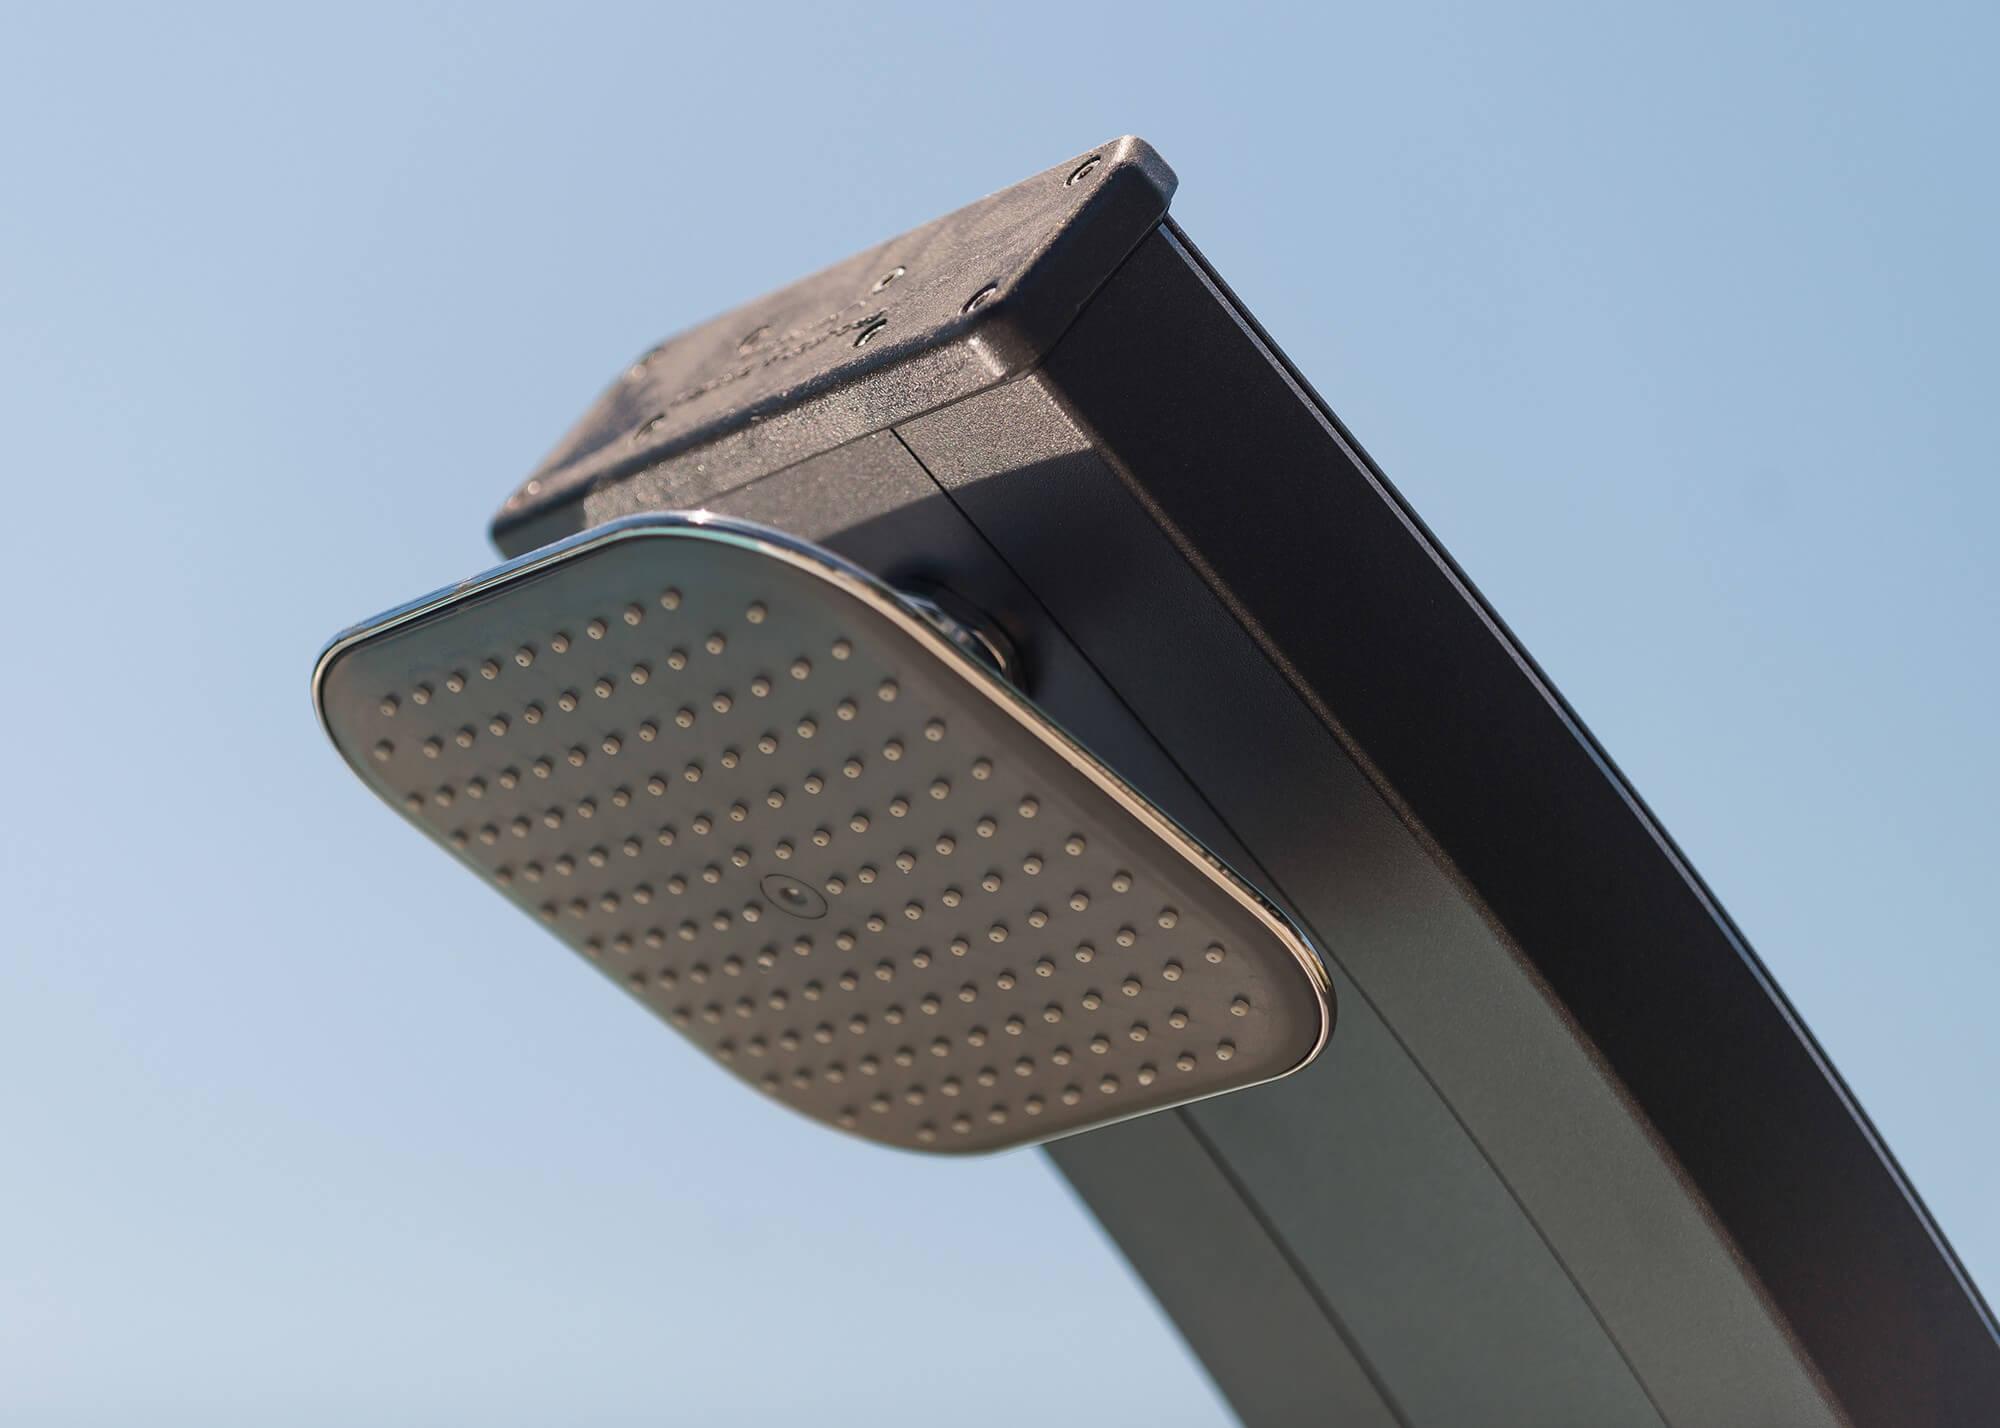 design barriere piscine aluminium nanterre 32 barriere de securite escalier ikea barriere. Black Bedroom Furniture Sets. Home Design Ideas